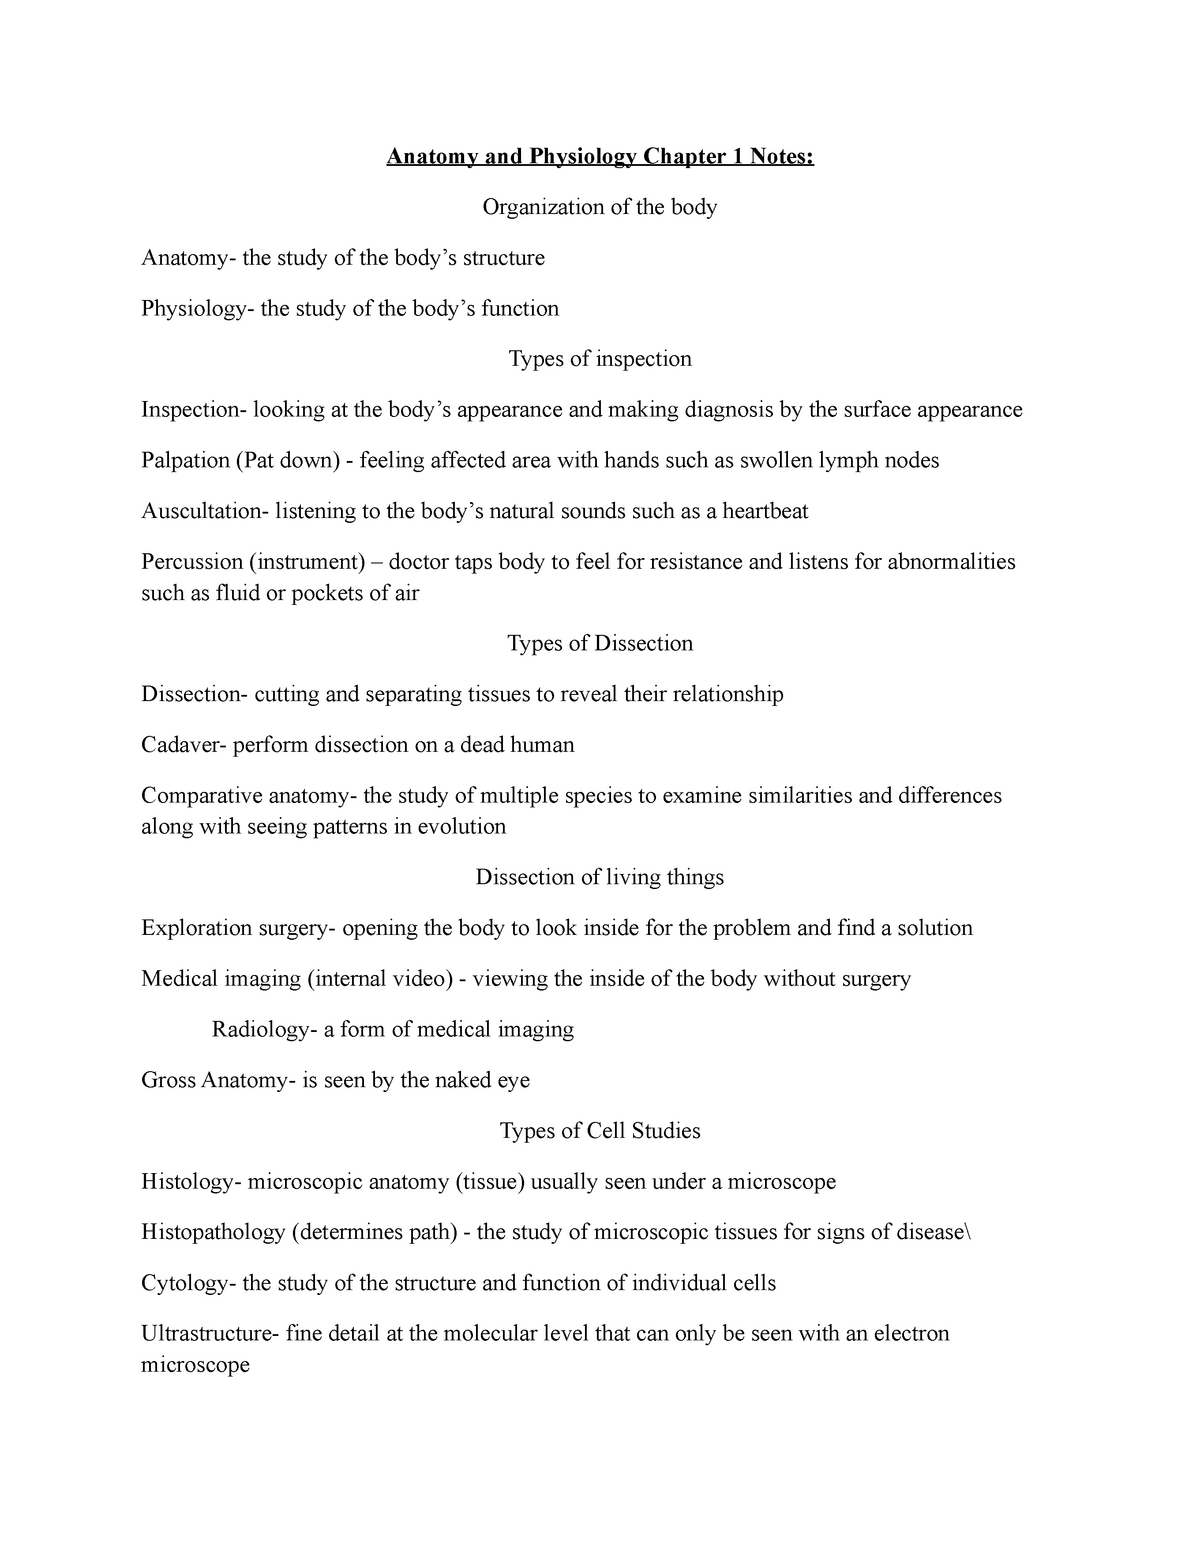 Docx - 2019-09-09T082025 - Biological Psychology C81BIO2